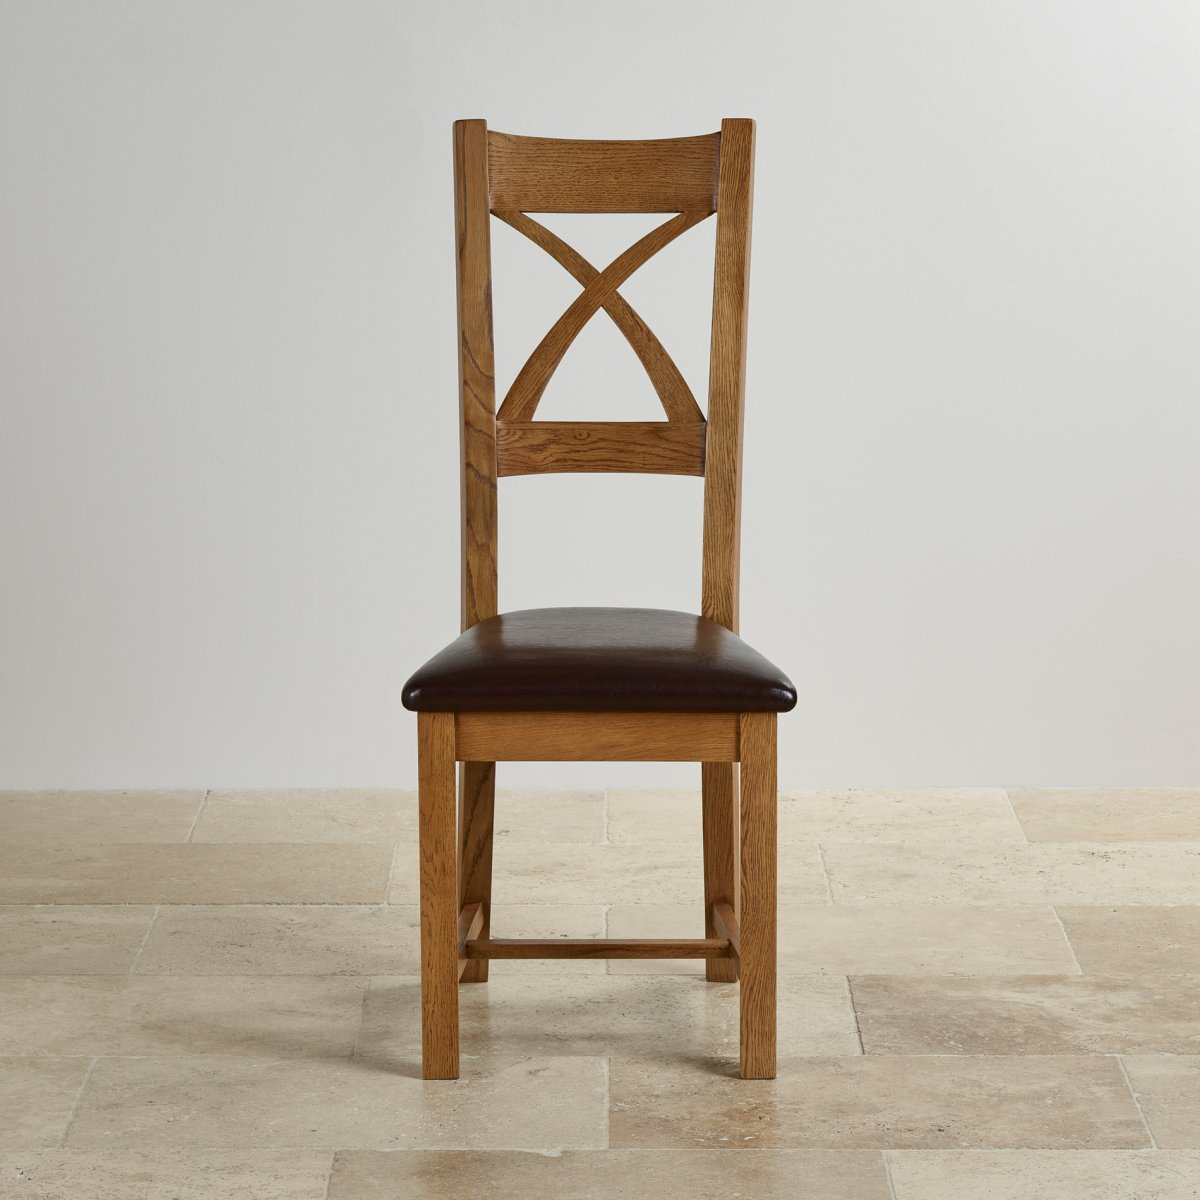 Cross Back Dining Chair in Rustic Oak Brown Leather : cross back rustic solid oak dining chair with brown leather chair pad 58ebb16d05f56ce3371dcfa6fa1a70db9cdd4d61004fc from www.oakfurnitureland.co.uk size 1200 x 1200 jpeg 142kB